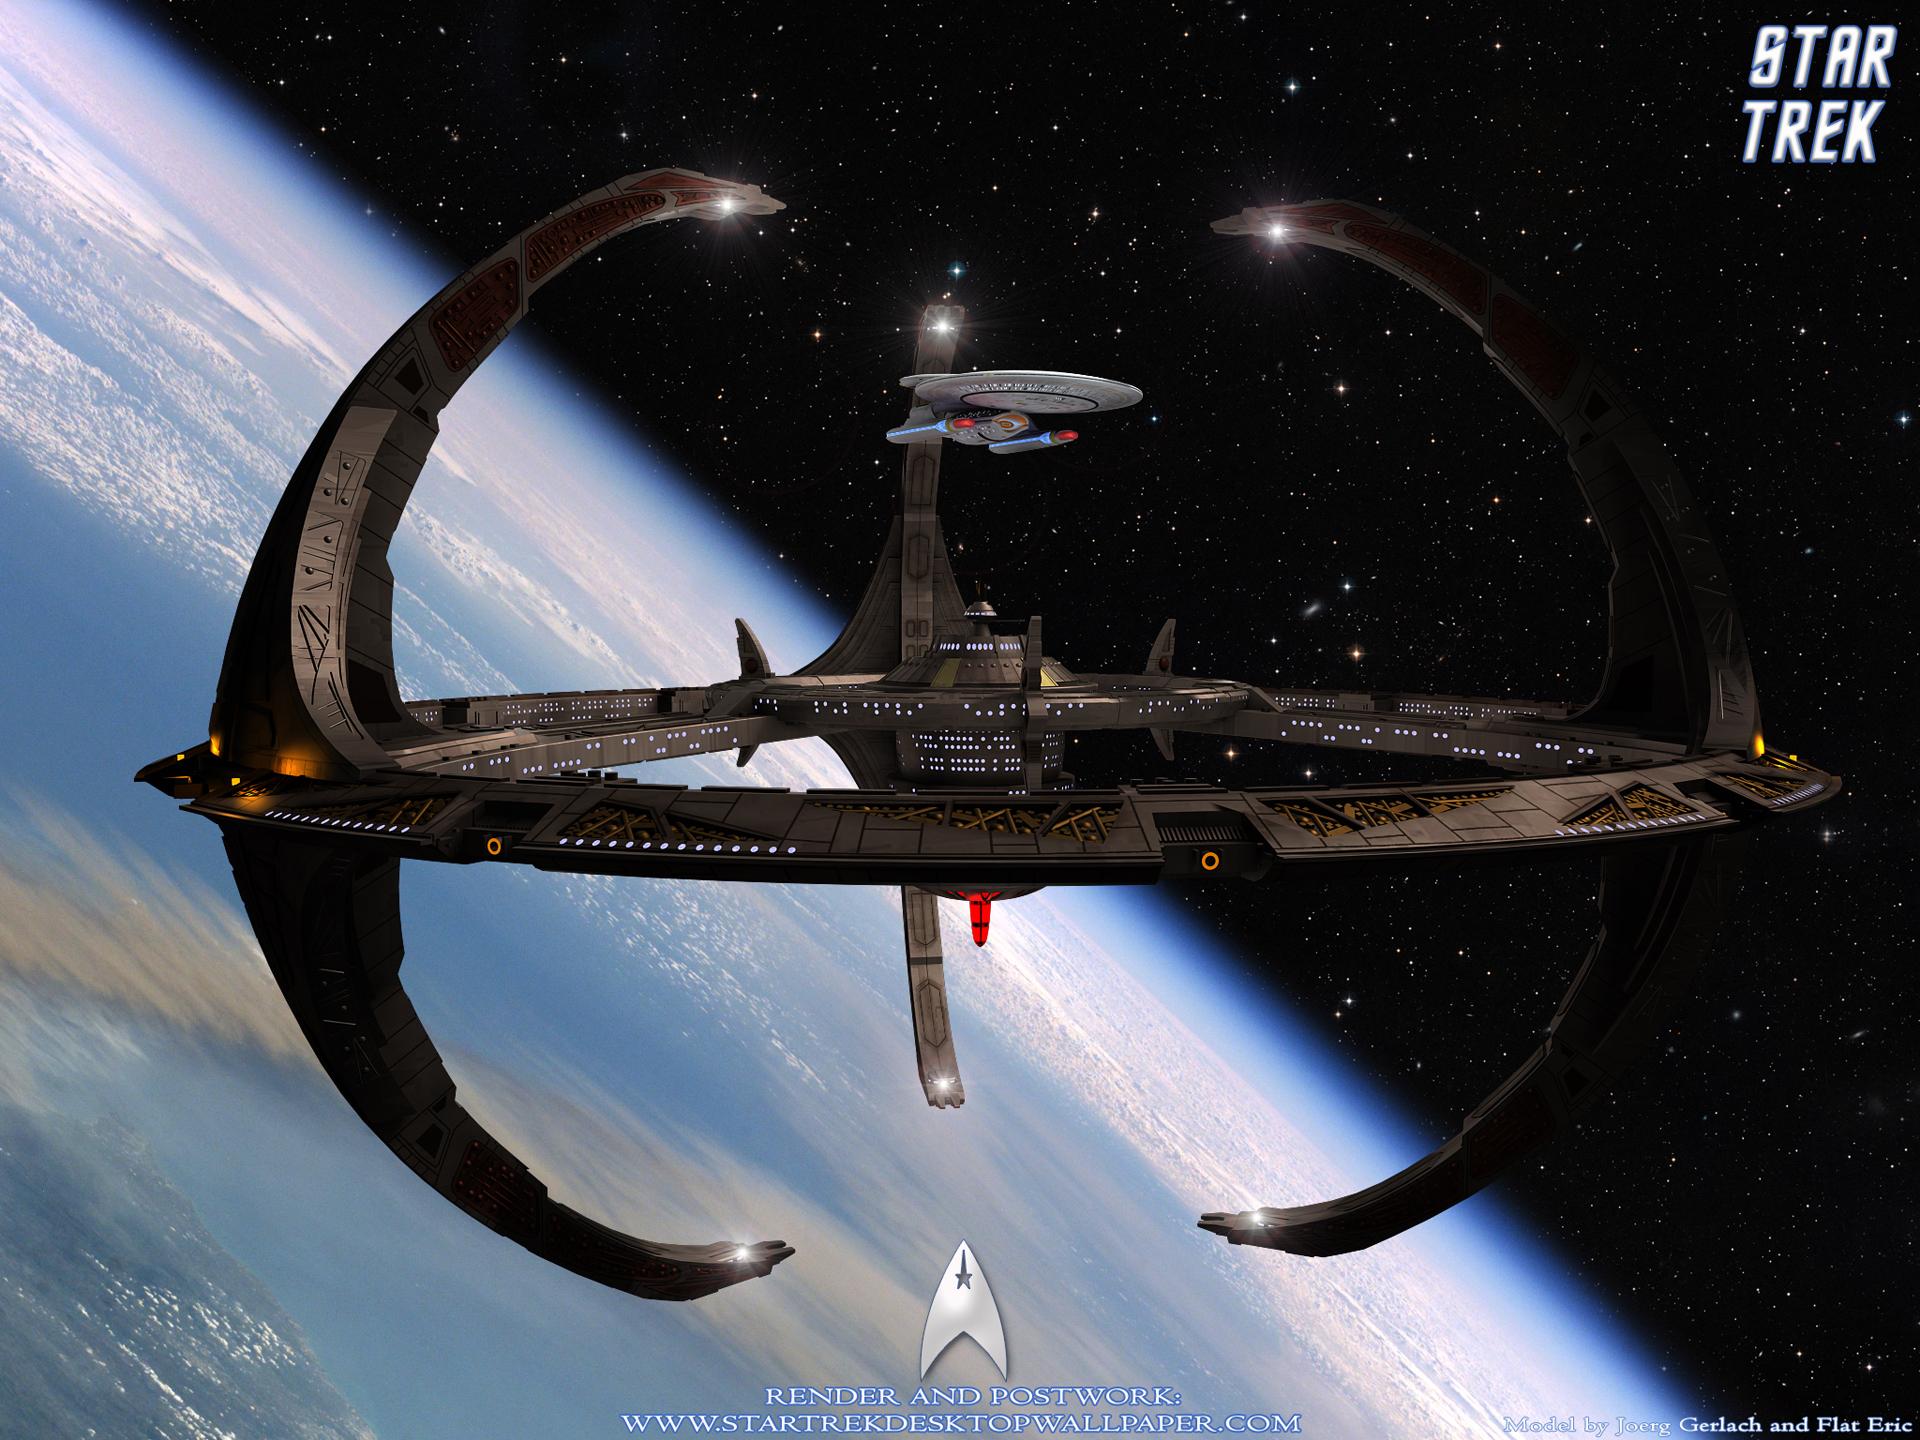 Star Trek website screen saver or desktop wallpaper Let us know 1920x1440